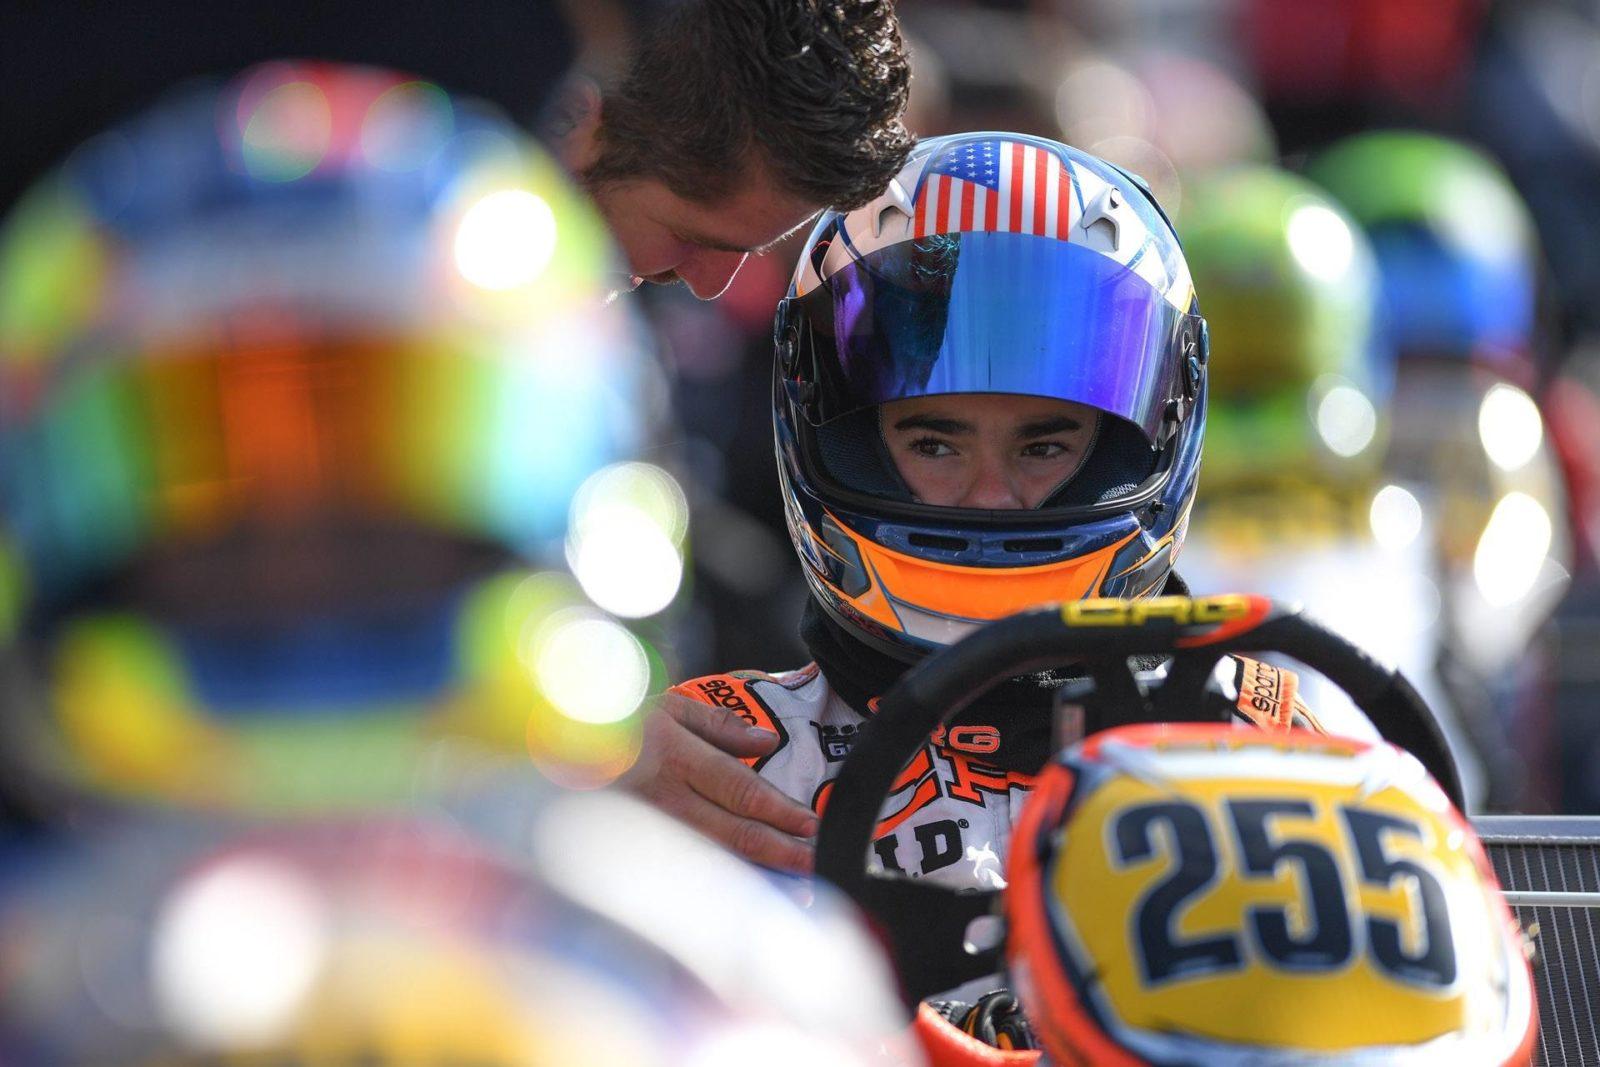 Enzo Scionti 2018 CIK World Junior Championship